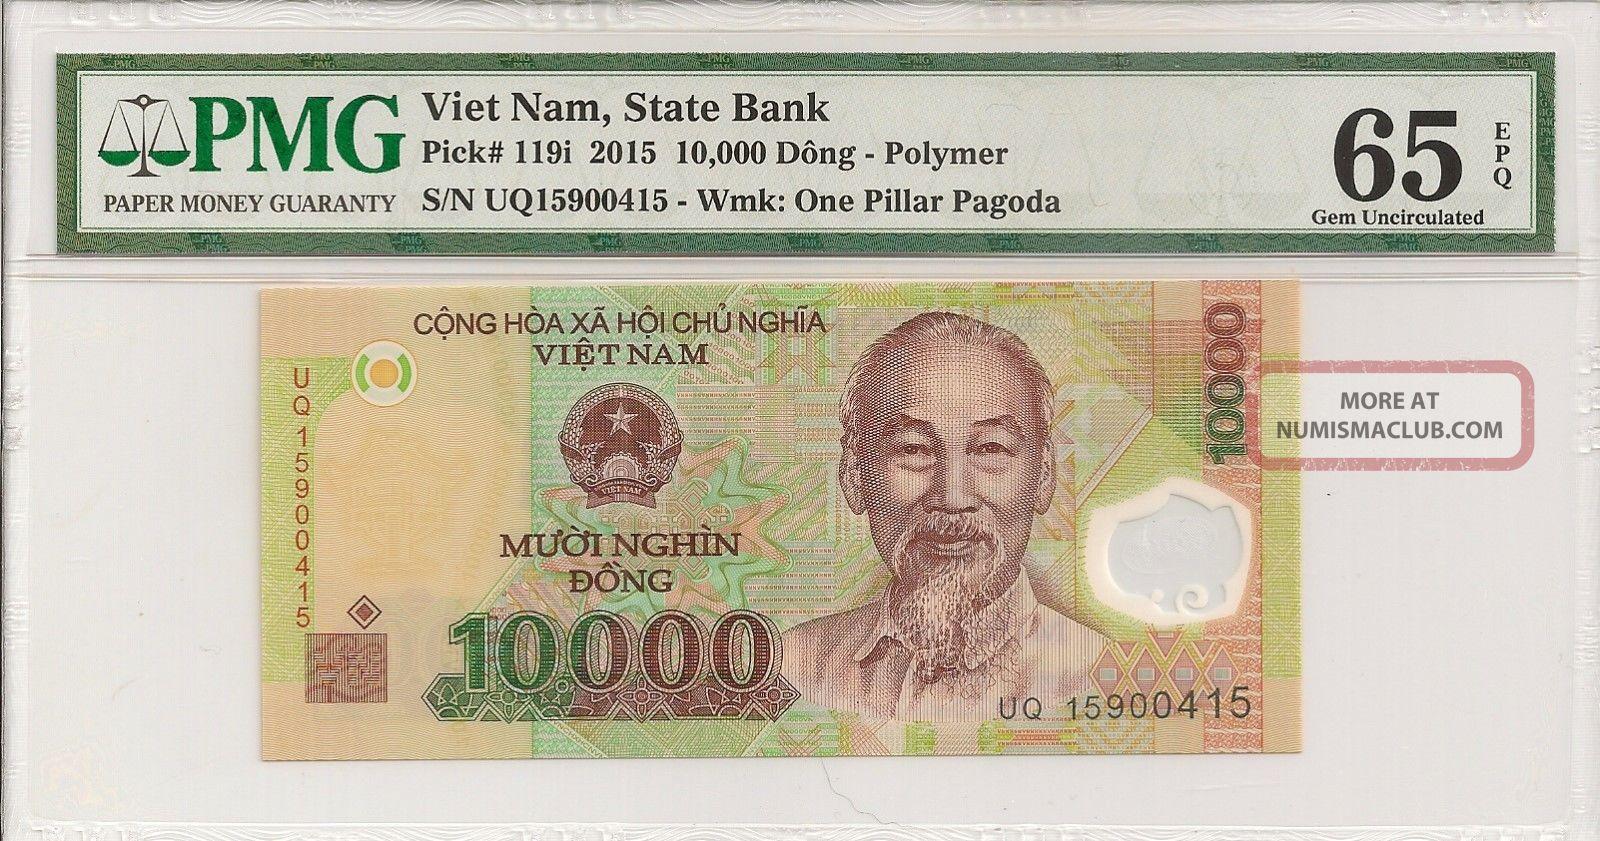 P - 119i 1988 2015 10,  000 Dong,  Viet Nam State Bank Pmg 65epq Gem Asia photo